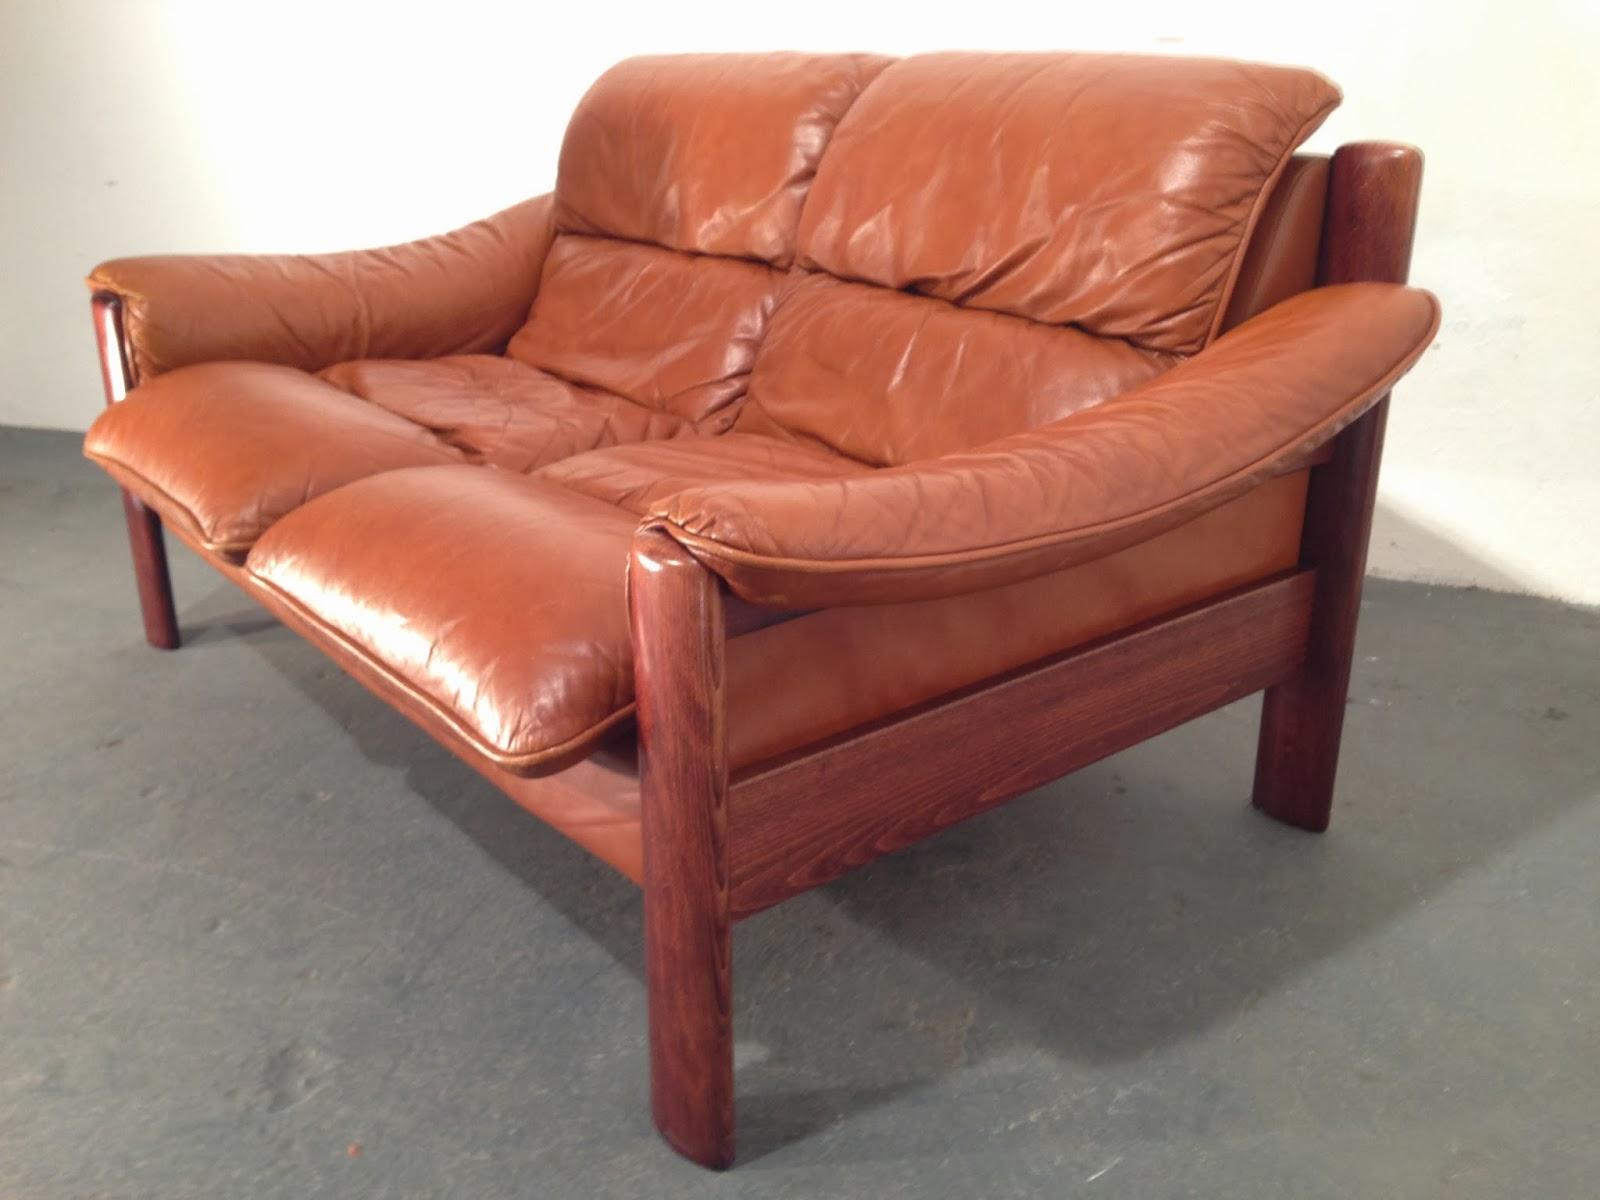 Vintage Danish Leather Sofa